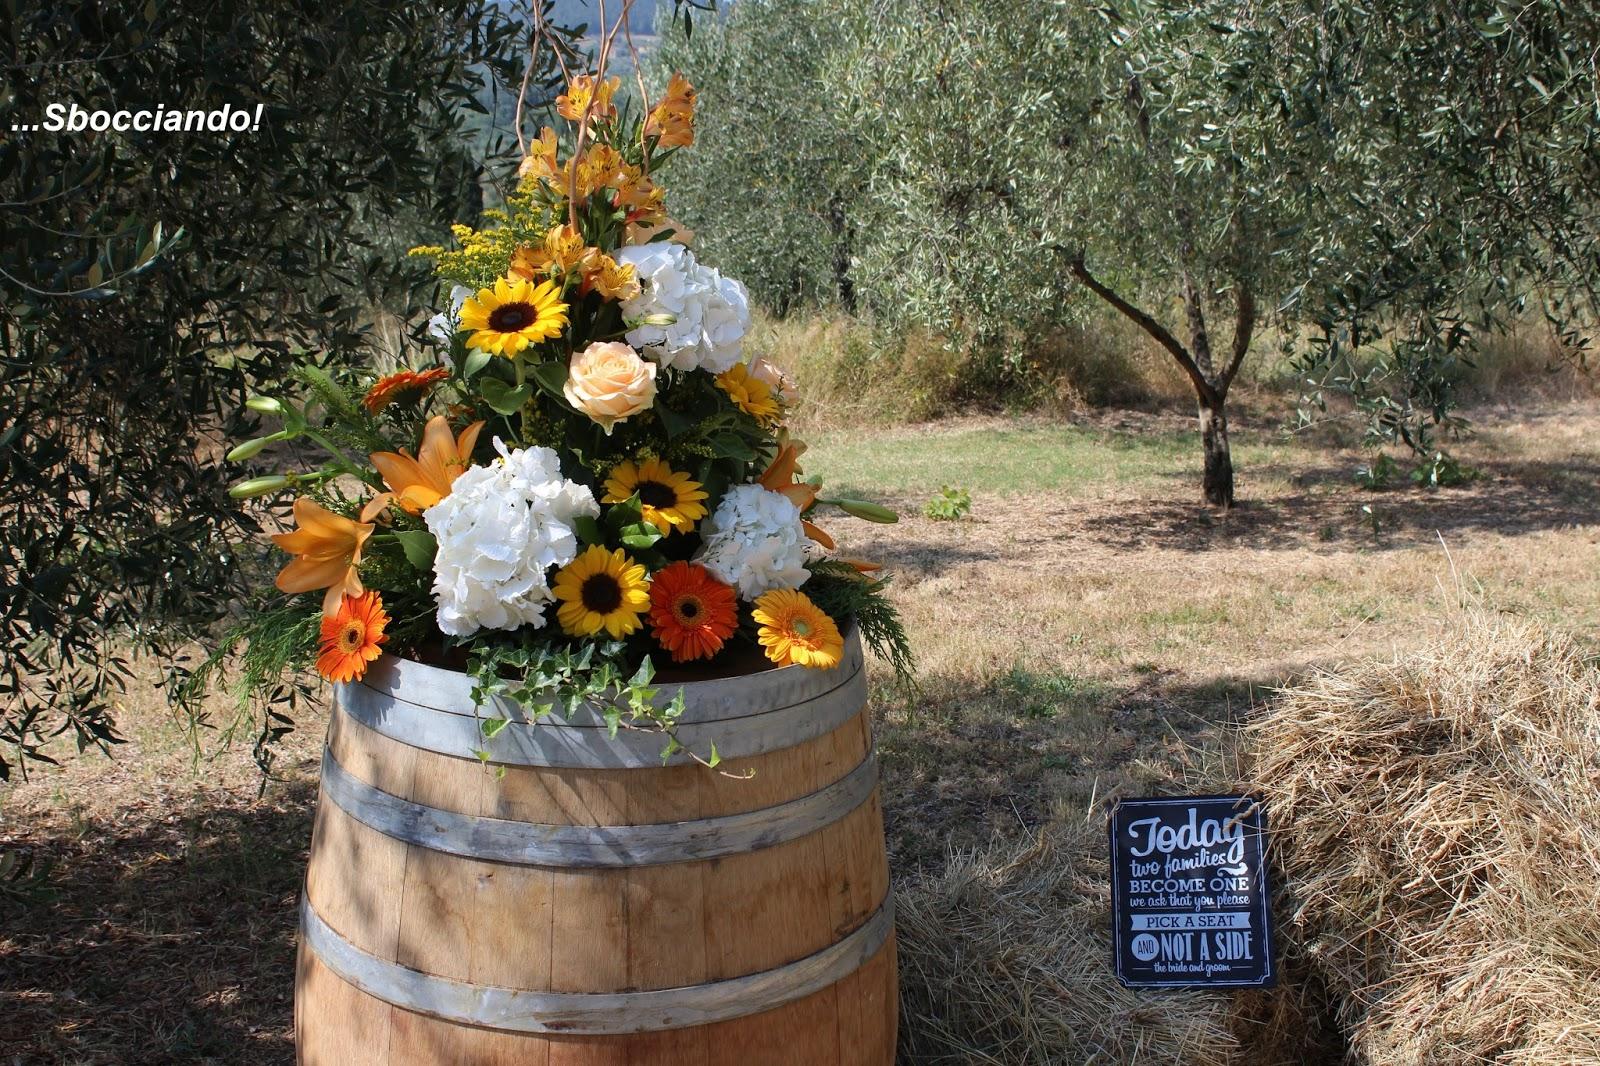 Matrimonio Tra Gli Ulivi Toscana : Sbocciando country wedding nella campagna toscana